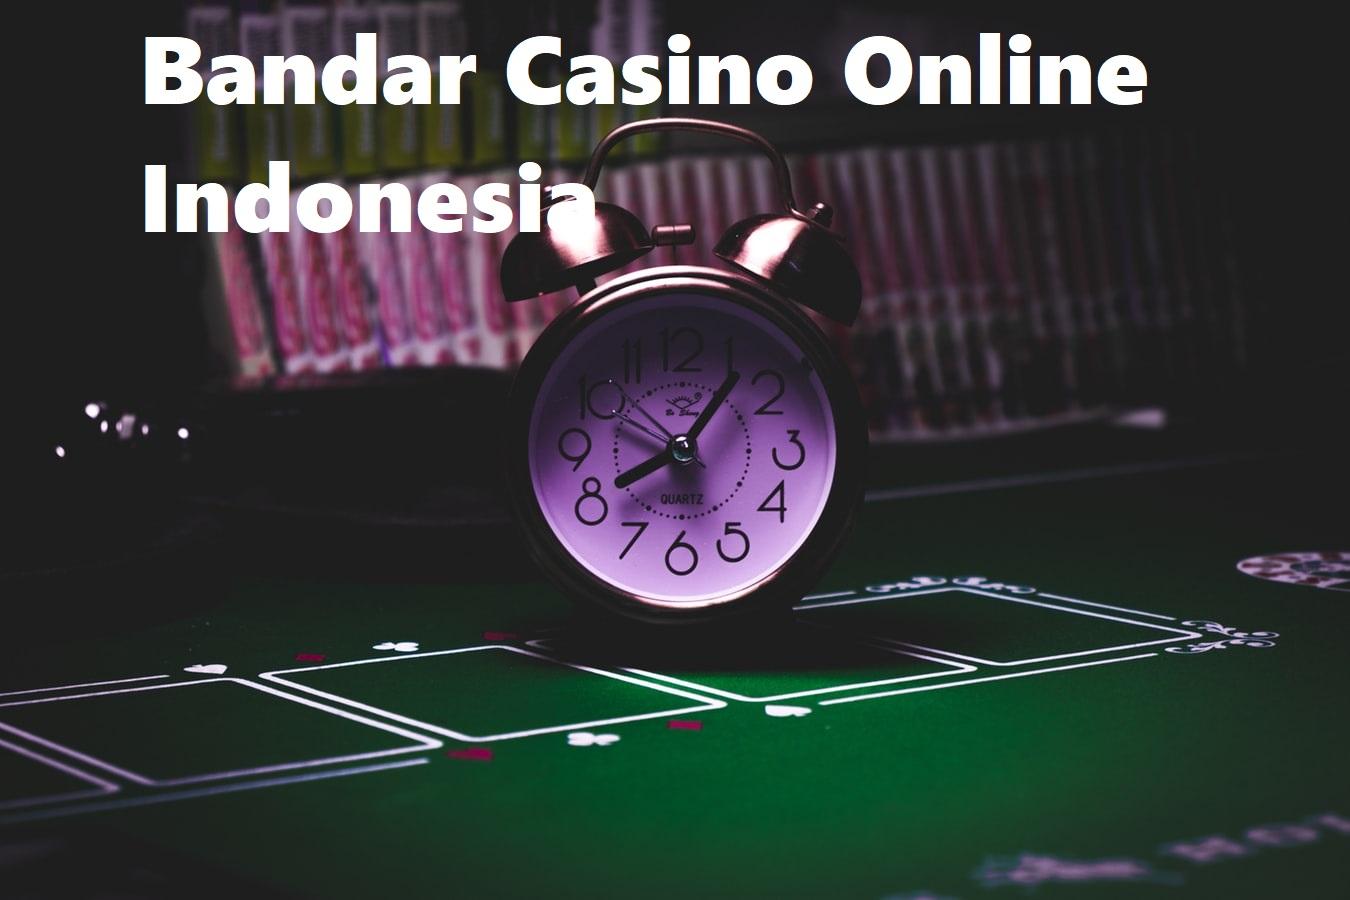 Bandar Casino Online Indonesia